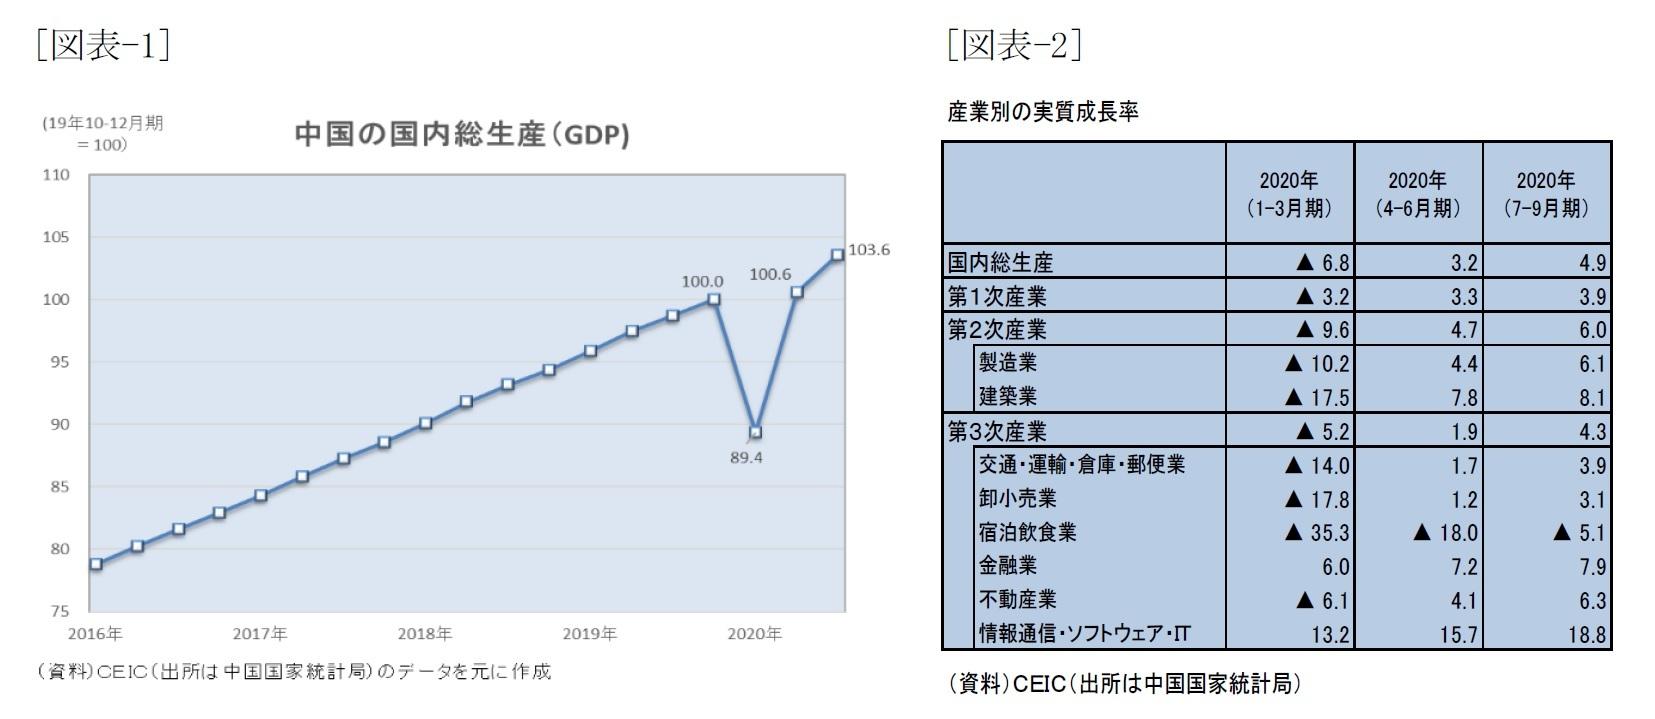 [図表-1]中国の国内総生産(GDP)/[図表-2]産業別の実質成長率